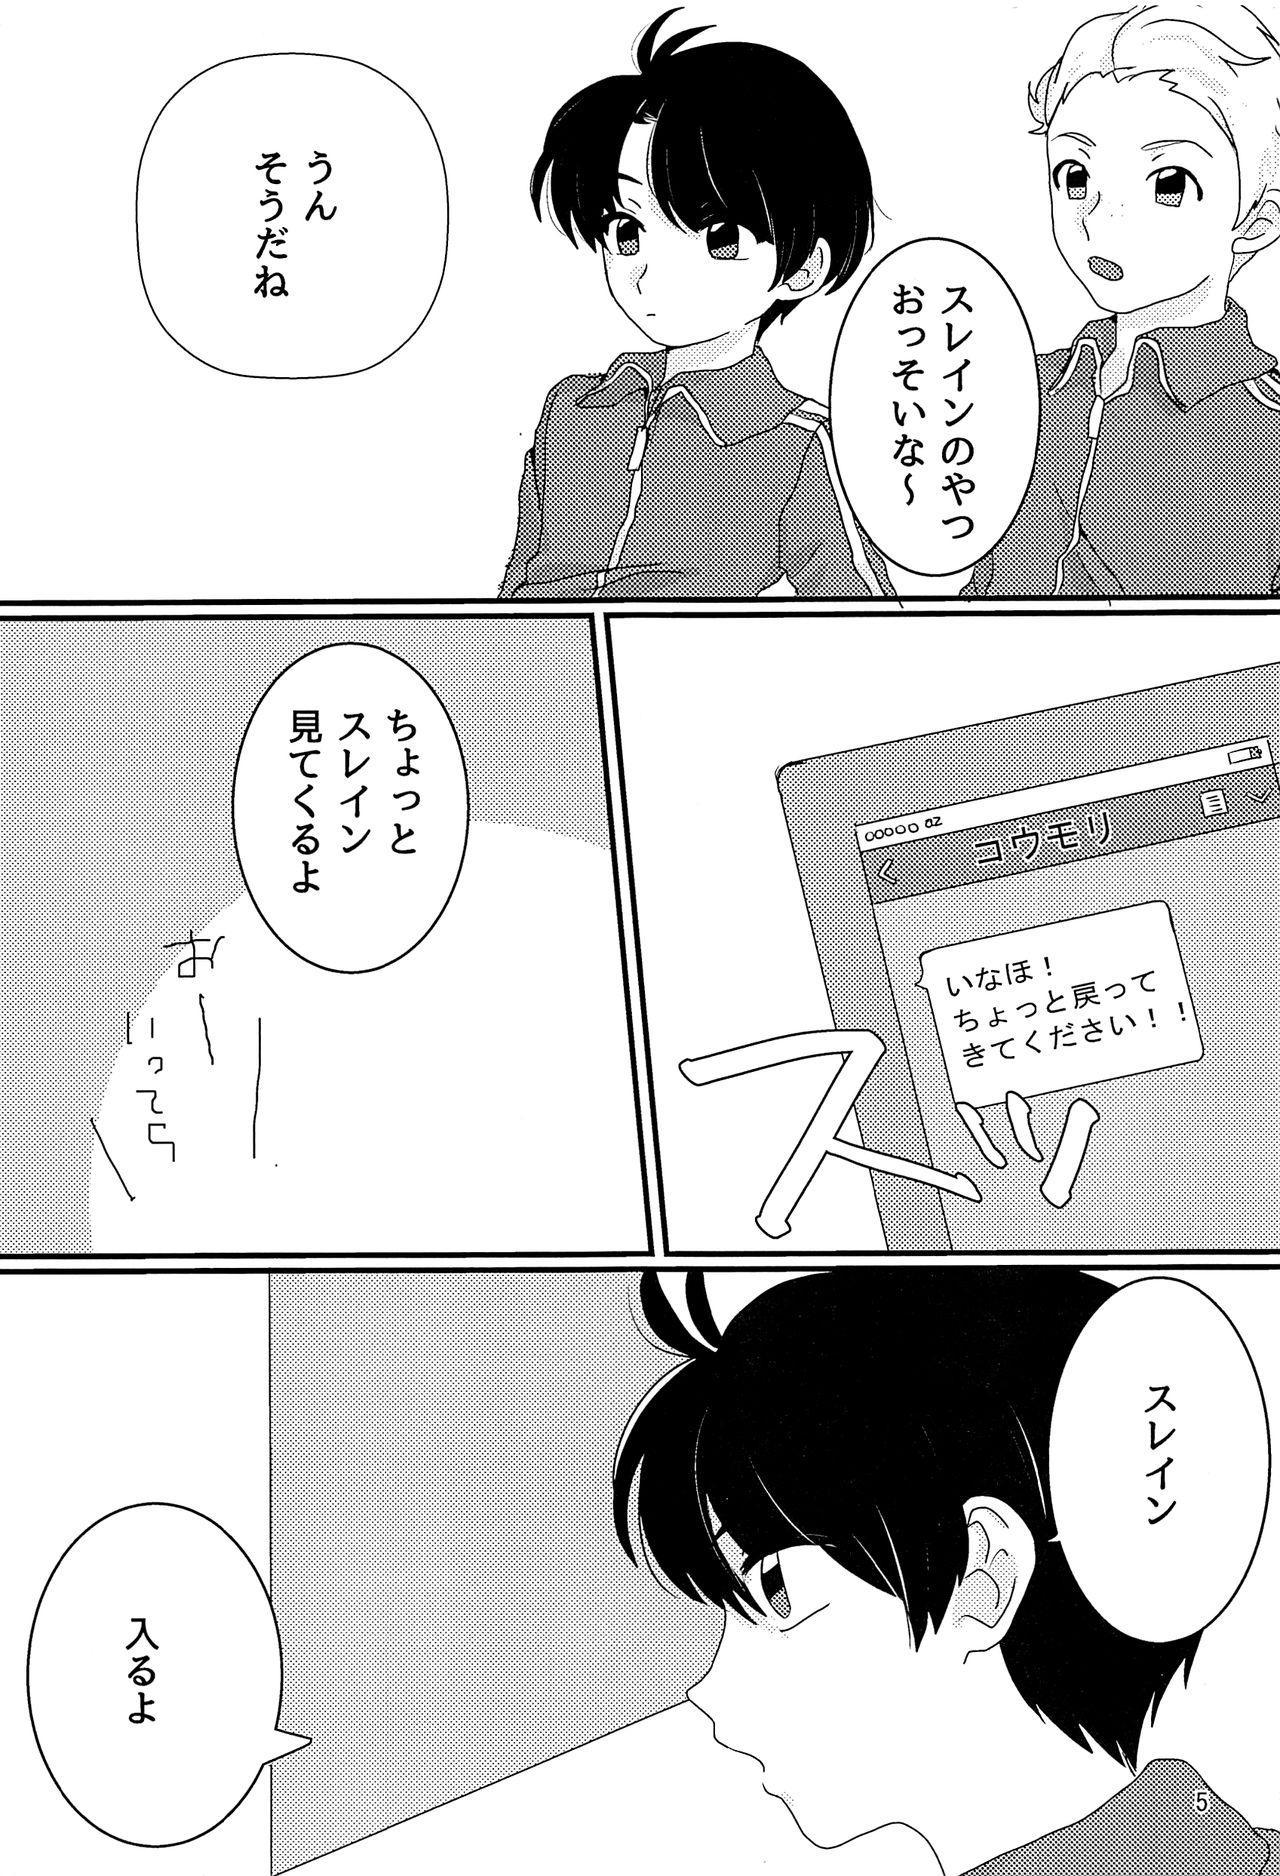 Taisougi wa ii ne. 3